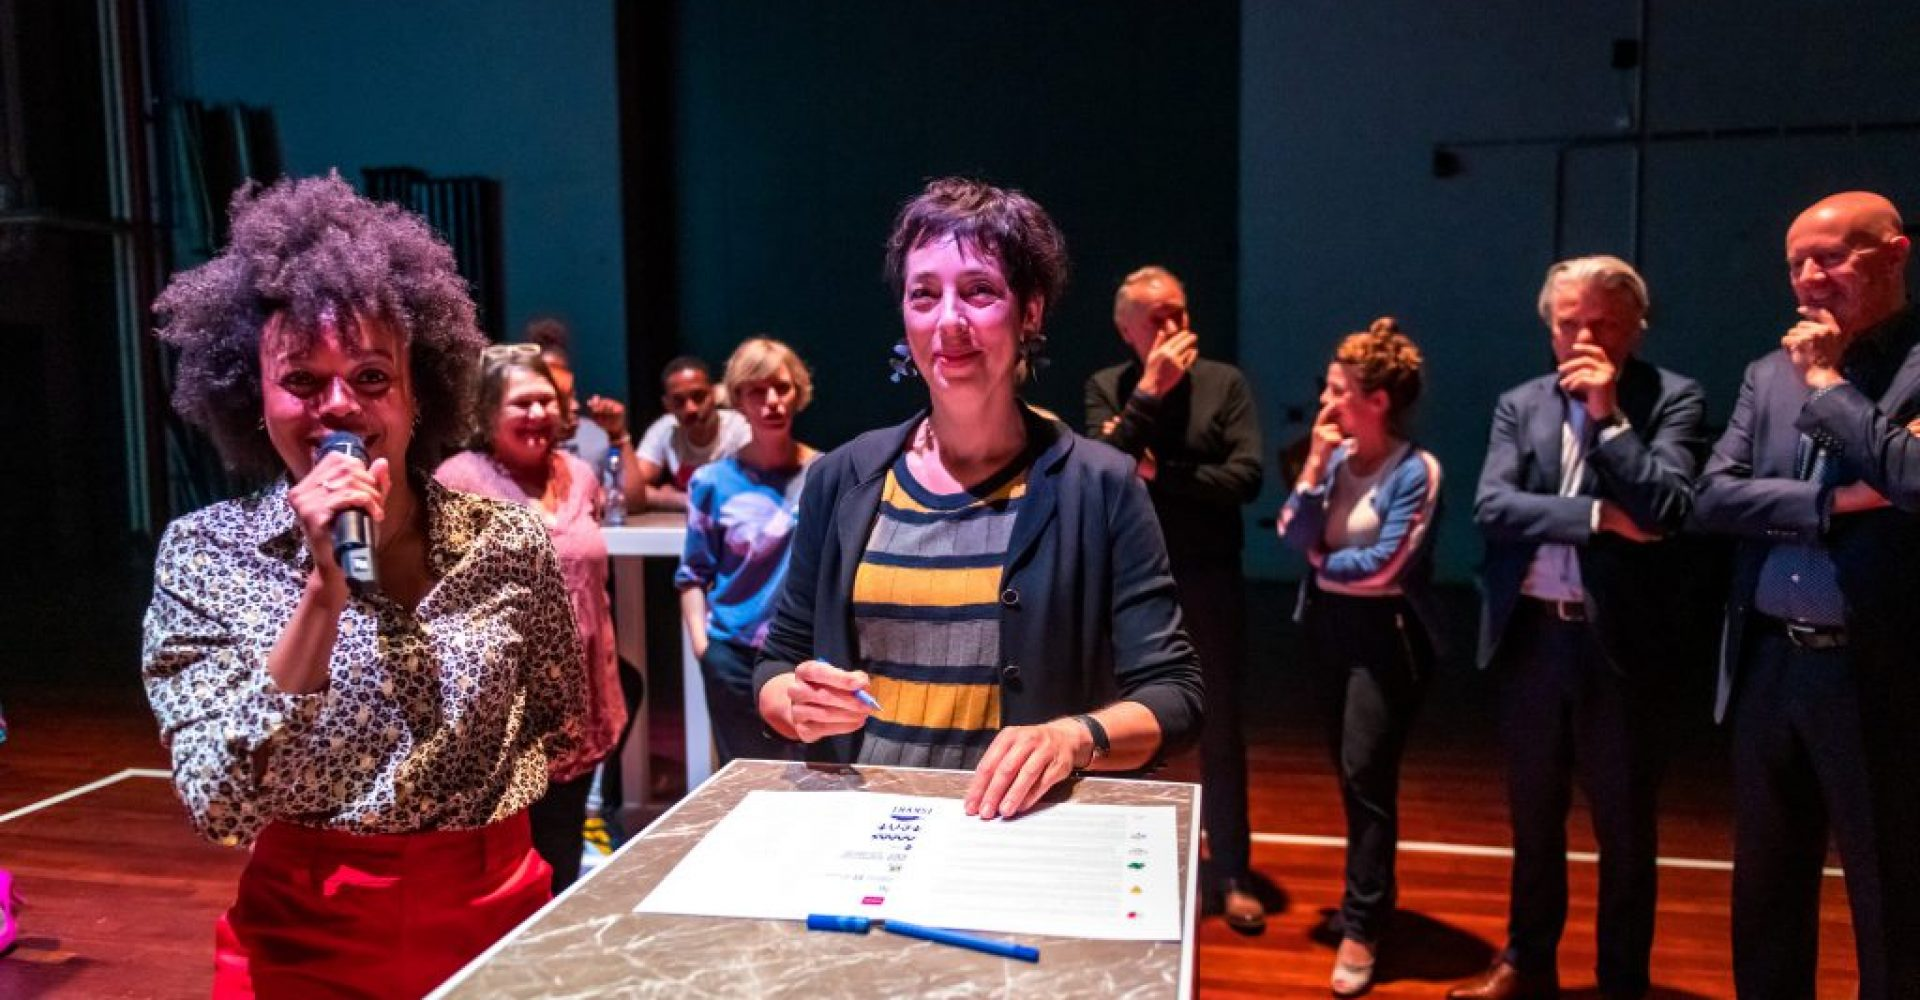 Intentieverklaring Zadkine en 12 culturele instellingen Rotterdam